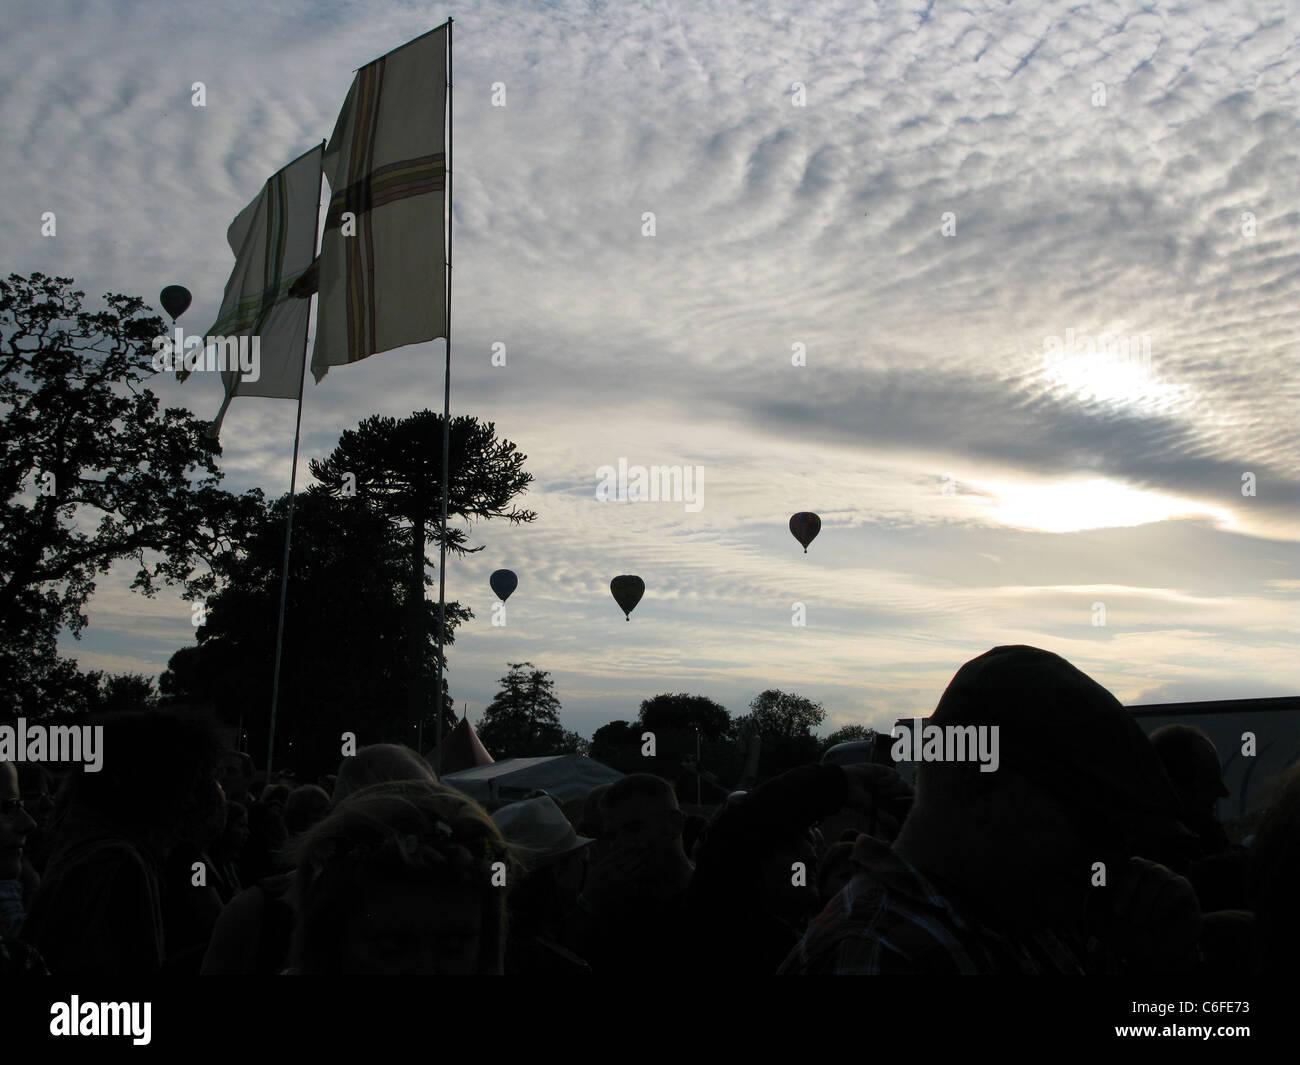 Cornbury Music Festival, Great Tew, Oxfordshire 2011 - Stock Image